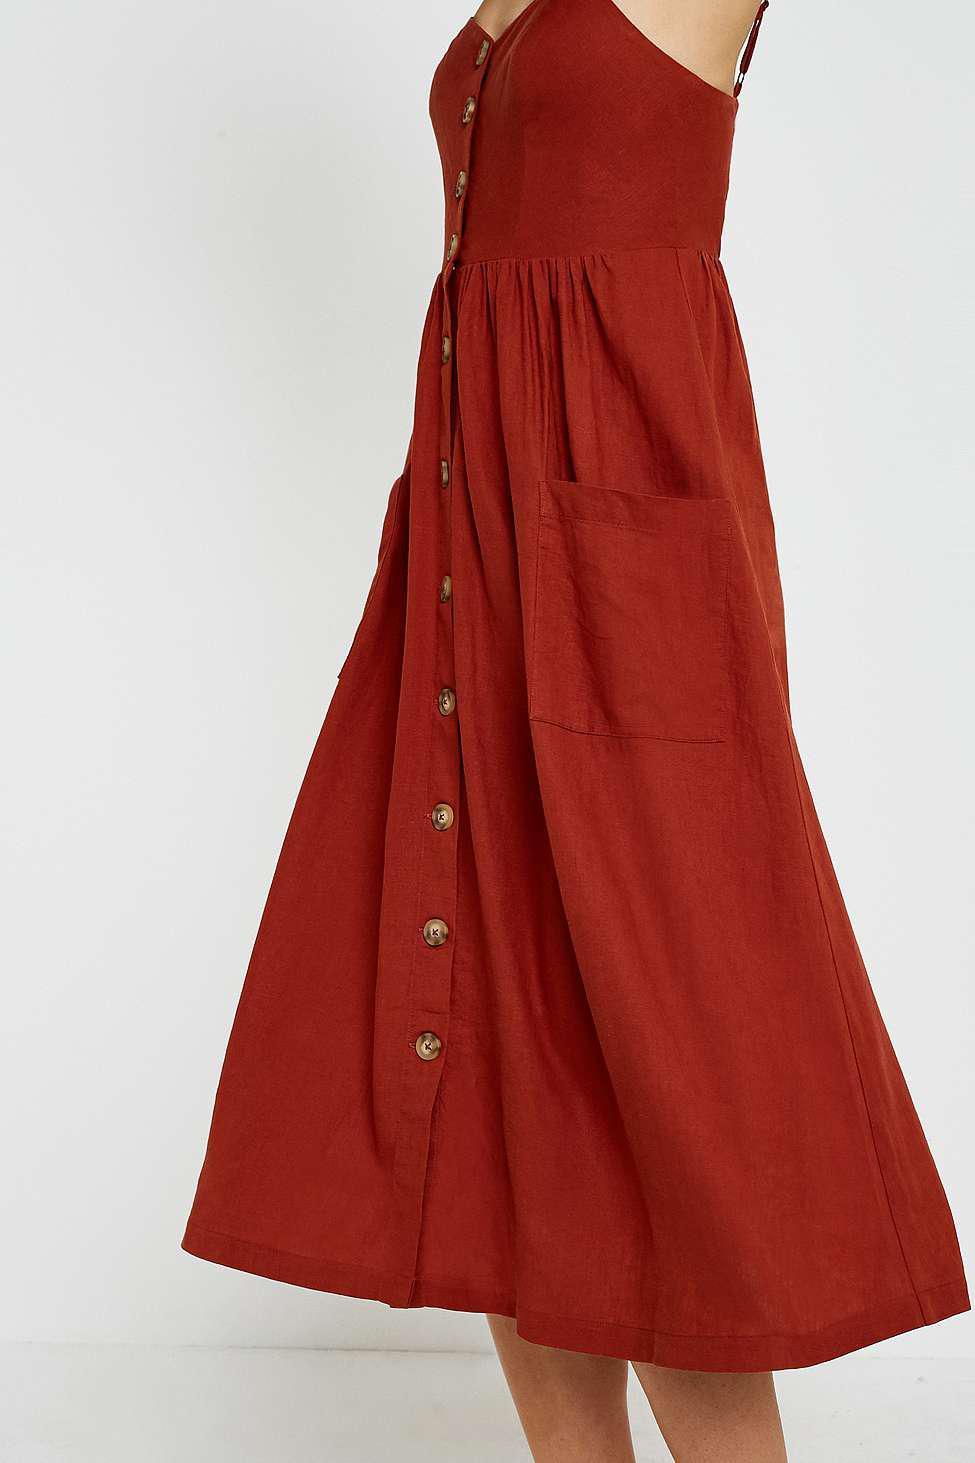 6d3d6a82e4 Urban Outfitters Uo Emilia Rust Button-through Midi Dress - Womens S ...